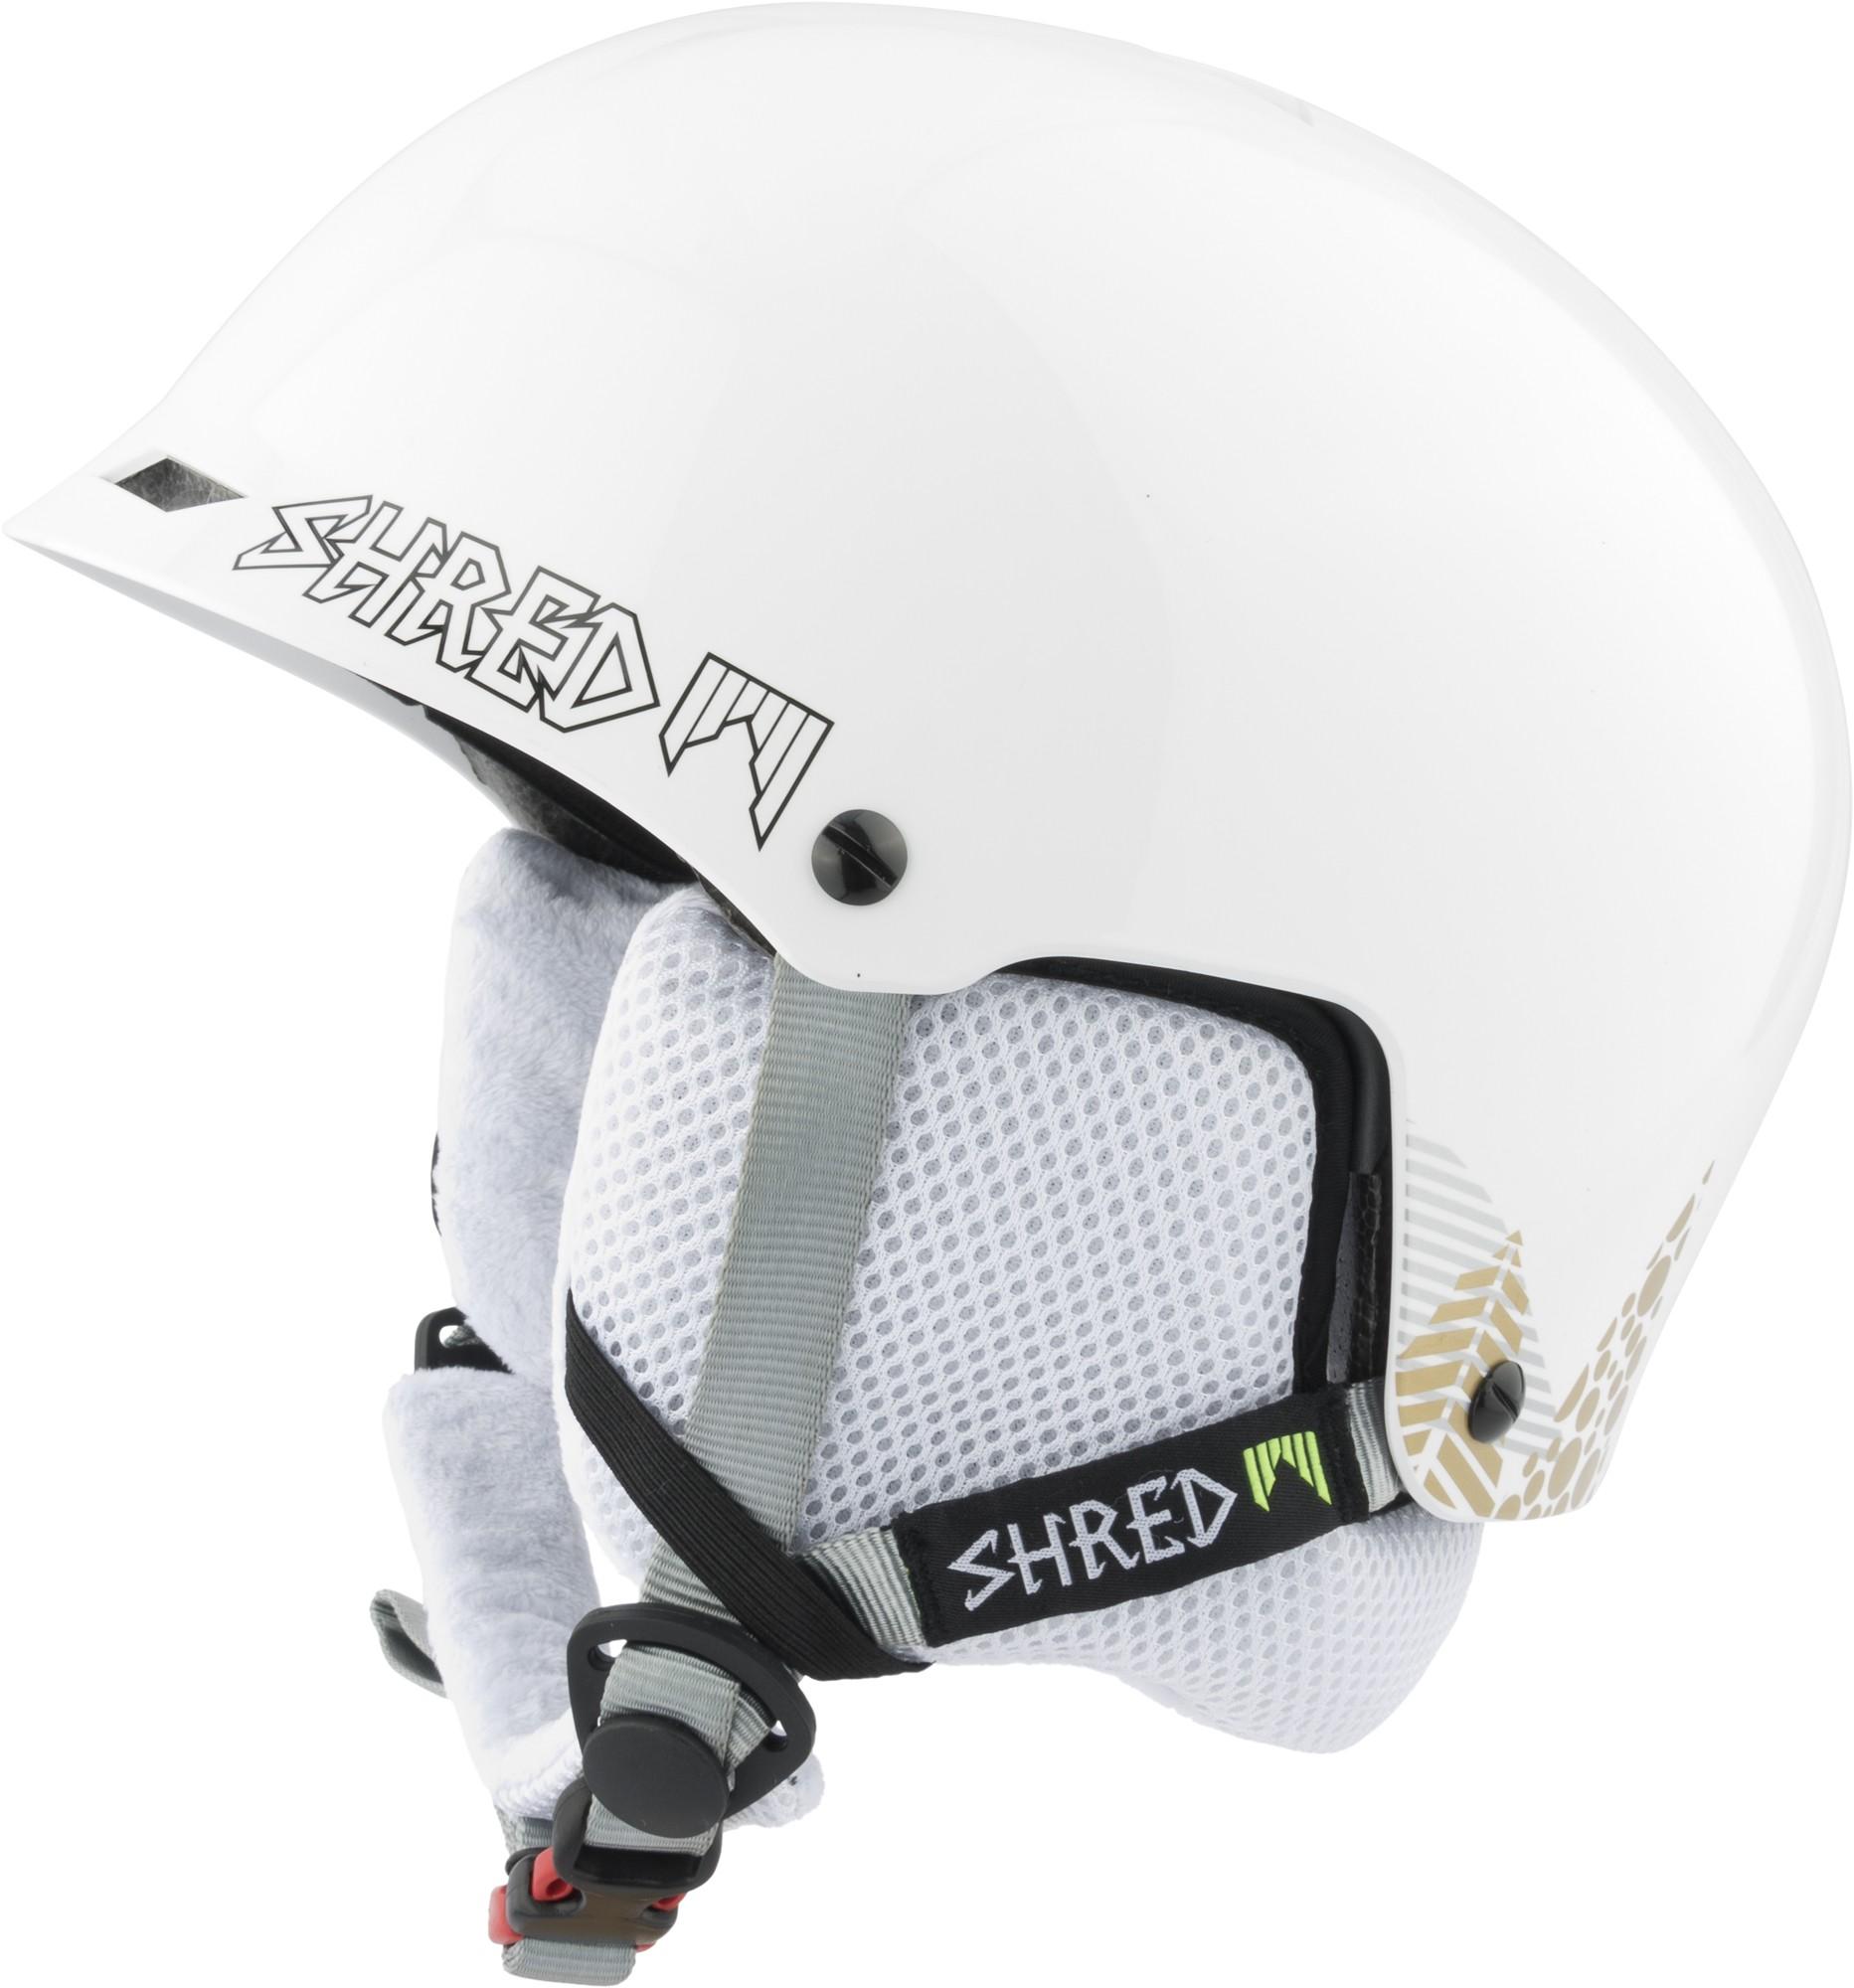 Shred Half Brain TIMBER ski helmet, 2017